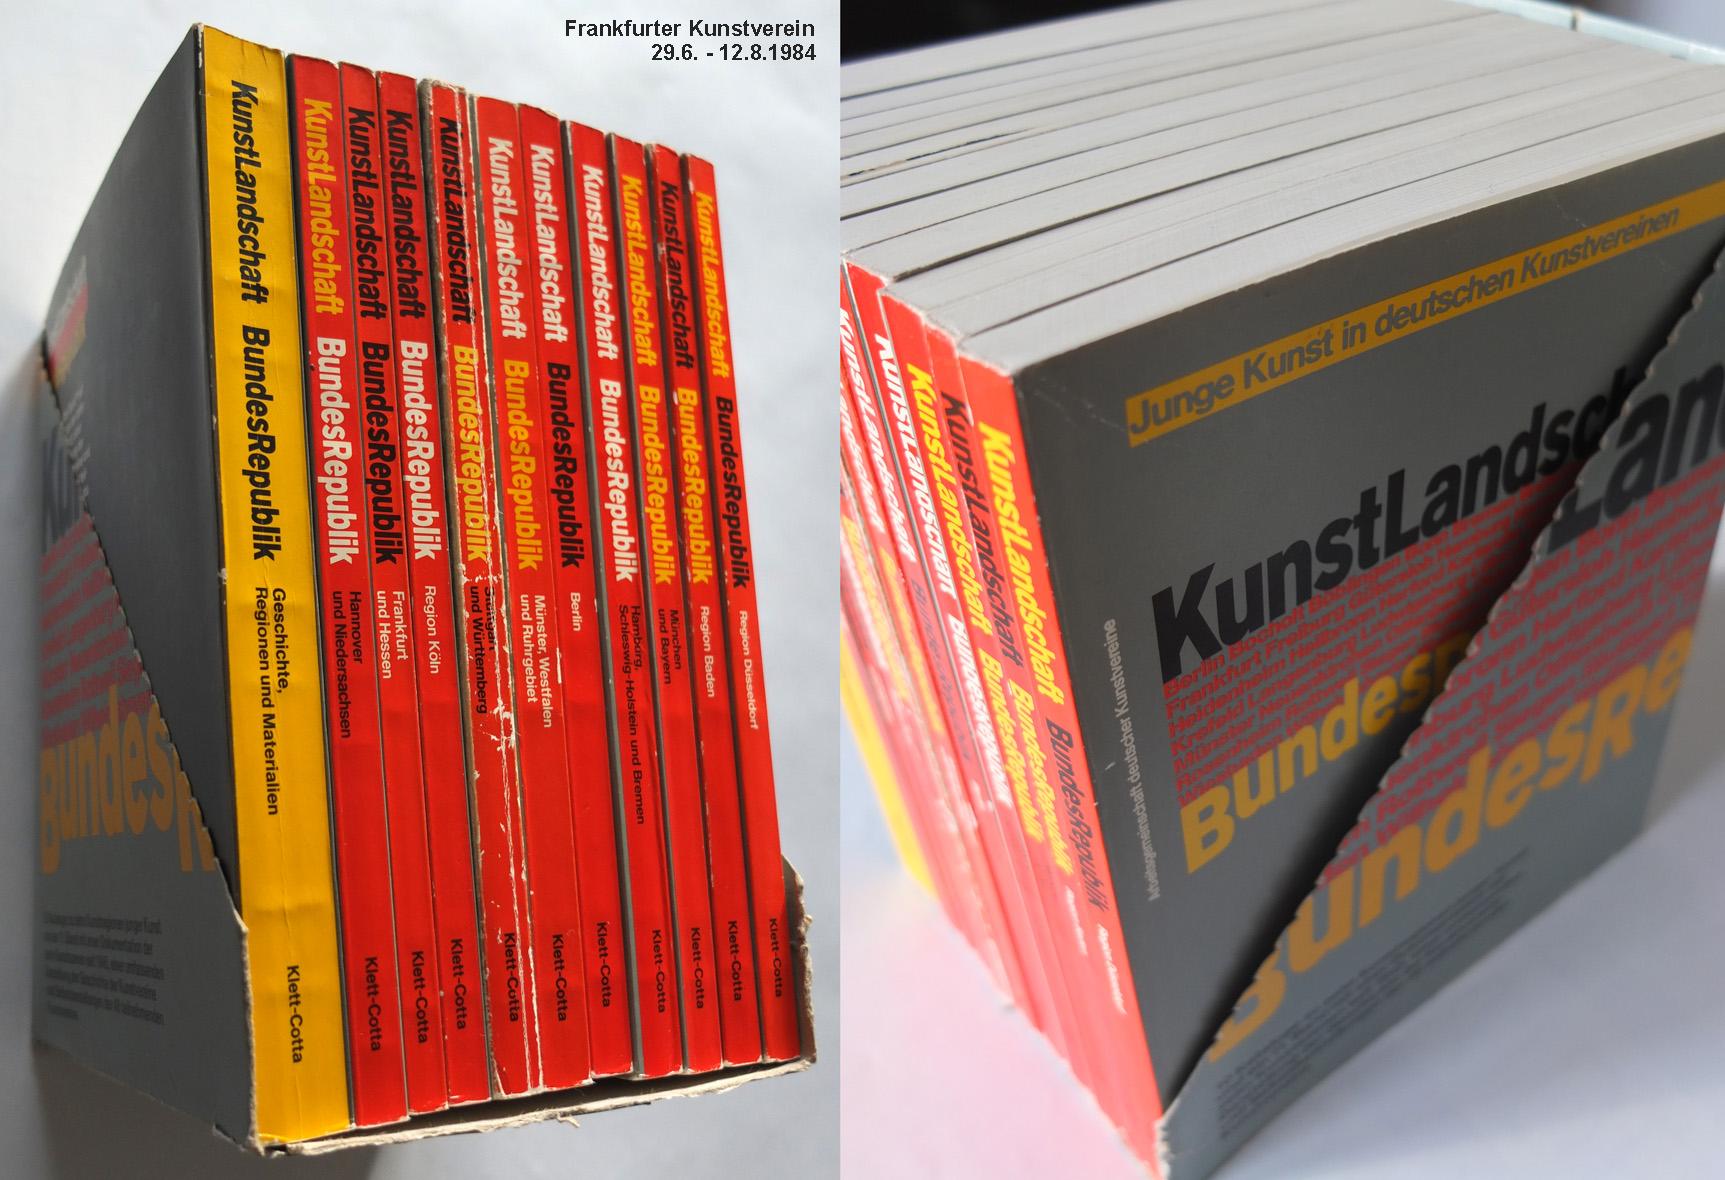 "Photo: Kataloge ""Kunstlandschaft Bundesrepublik"" z.B. Region Stuttgart u. Württemberg Frankfurter Kunstverein 29.6. - 12.8.1984"